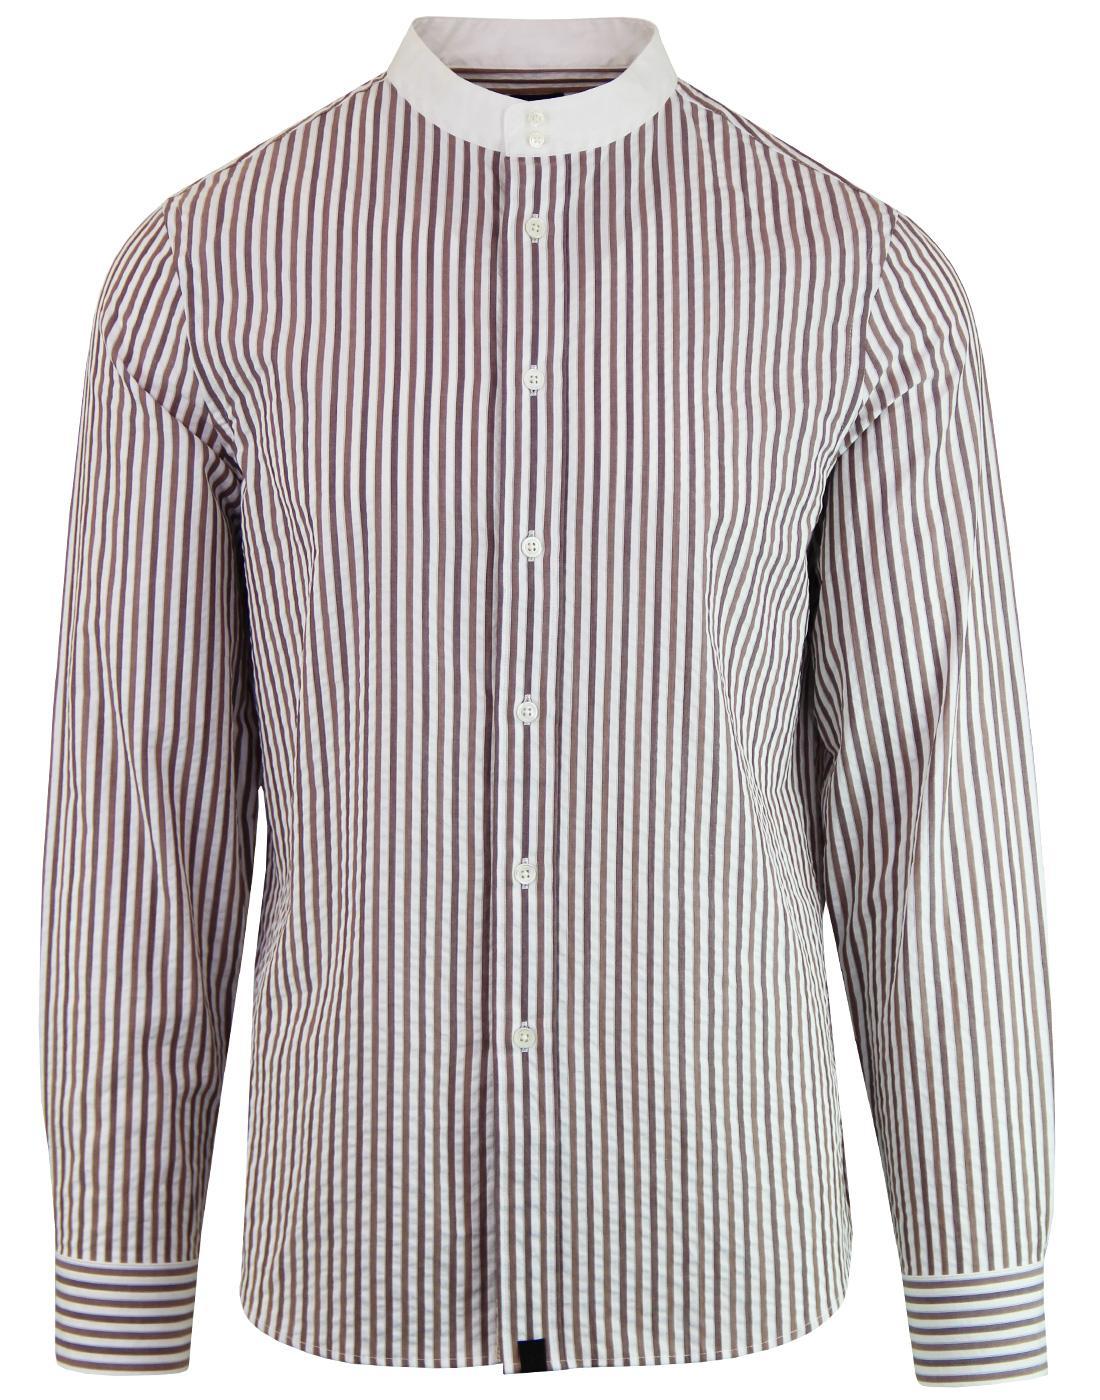 PRETTY GREEN Black Label Seersucker Kaftan Shirt